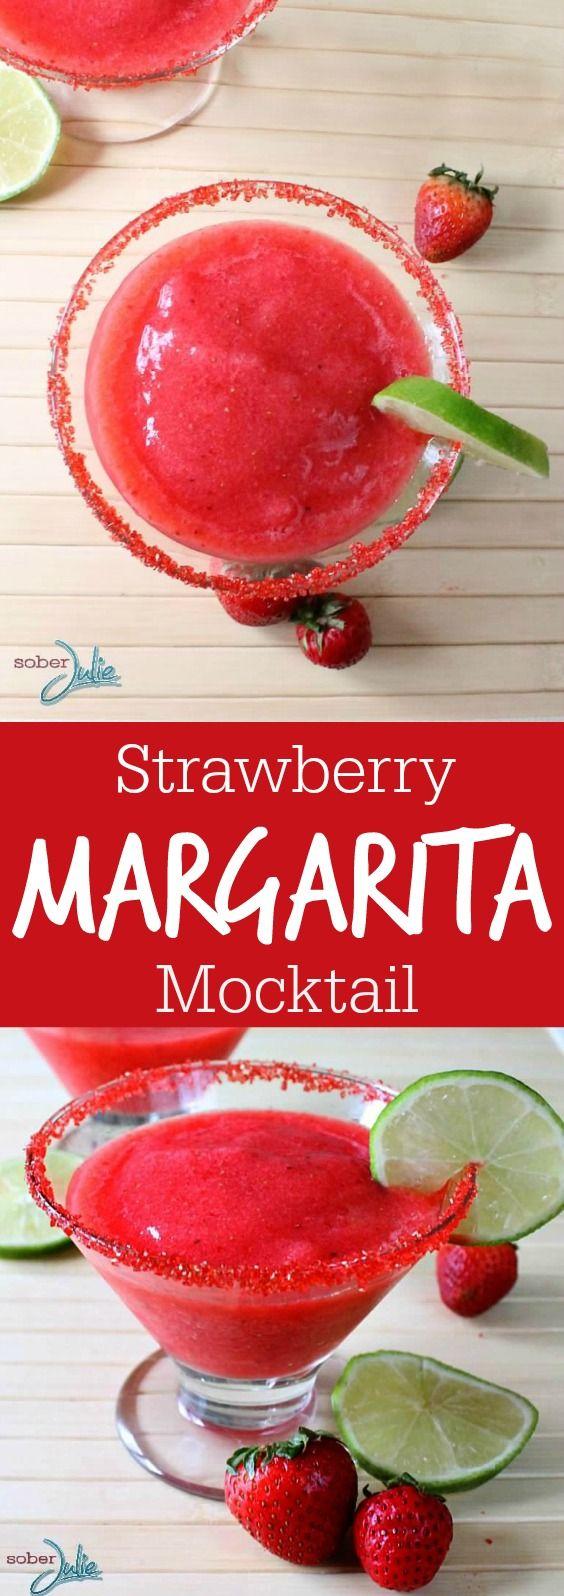 STRAWBERRY MARGARITA MOCKTAIL